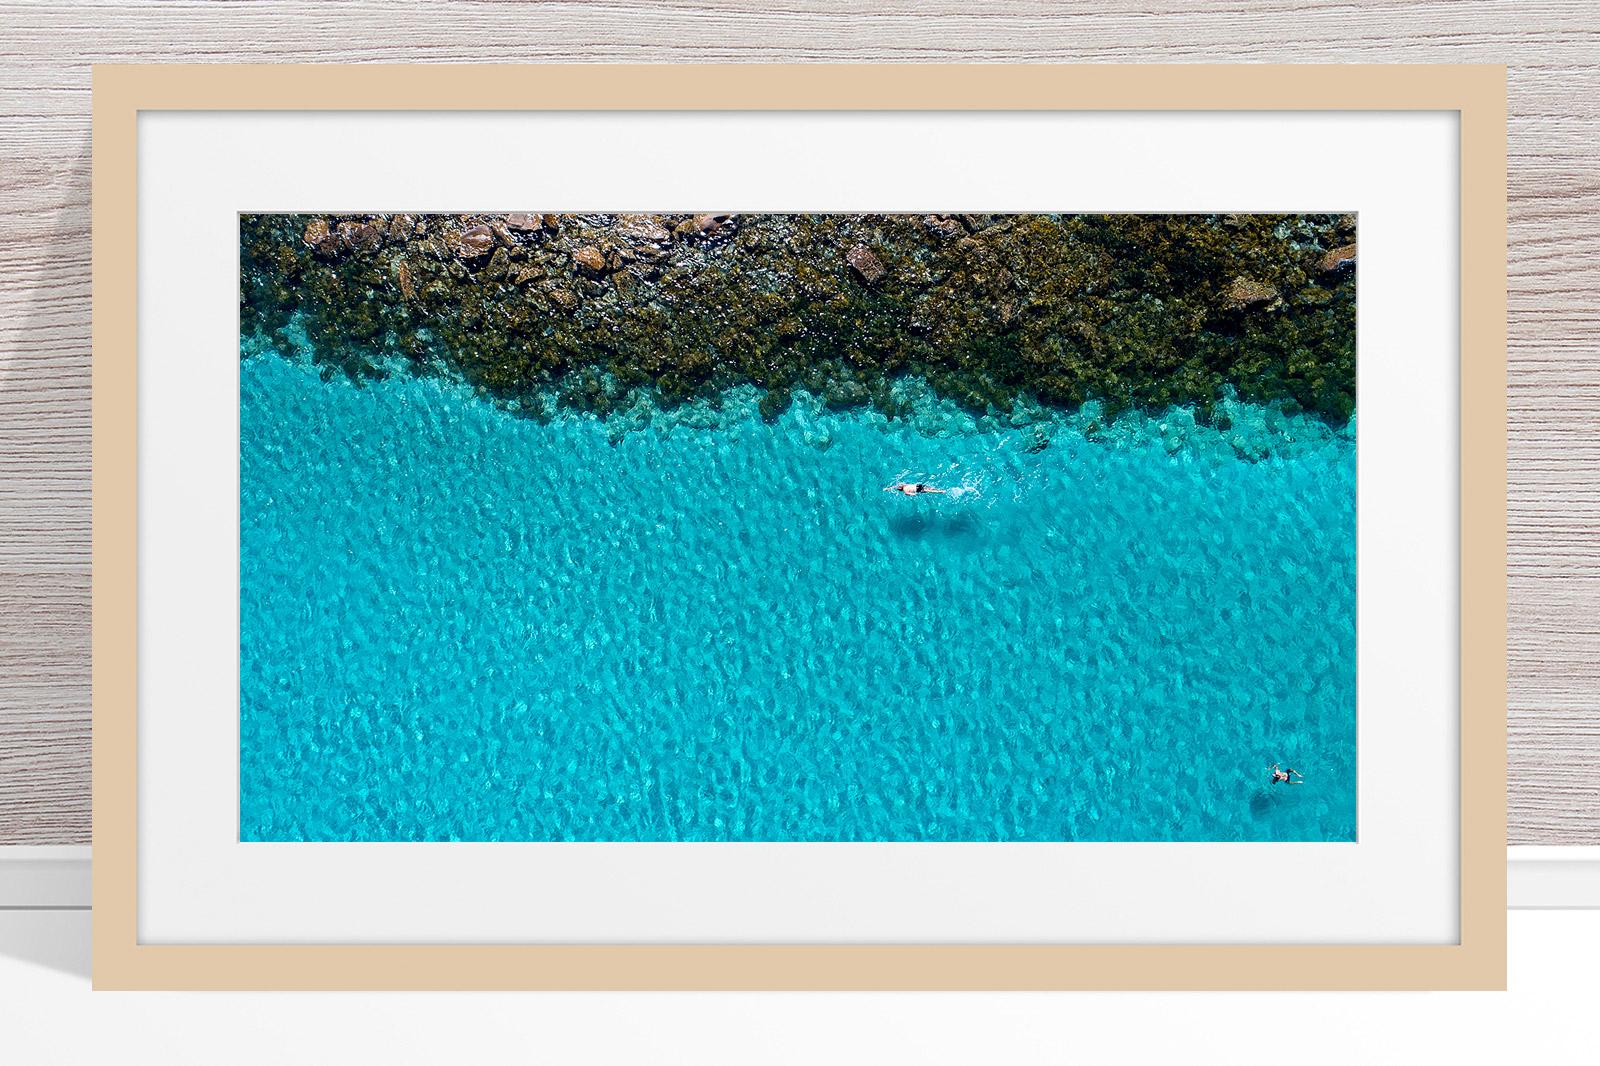 026 - Jason Mazur - 'Swimmers, Geographe Bay, Dunsborough' Light Frame